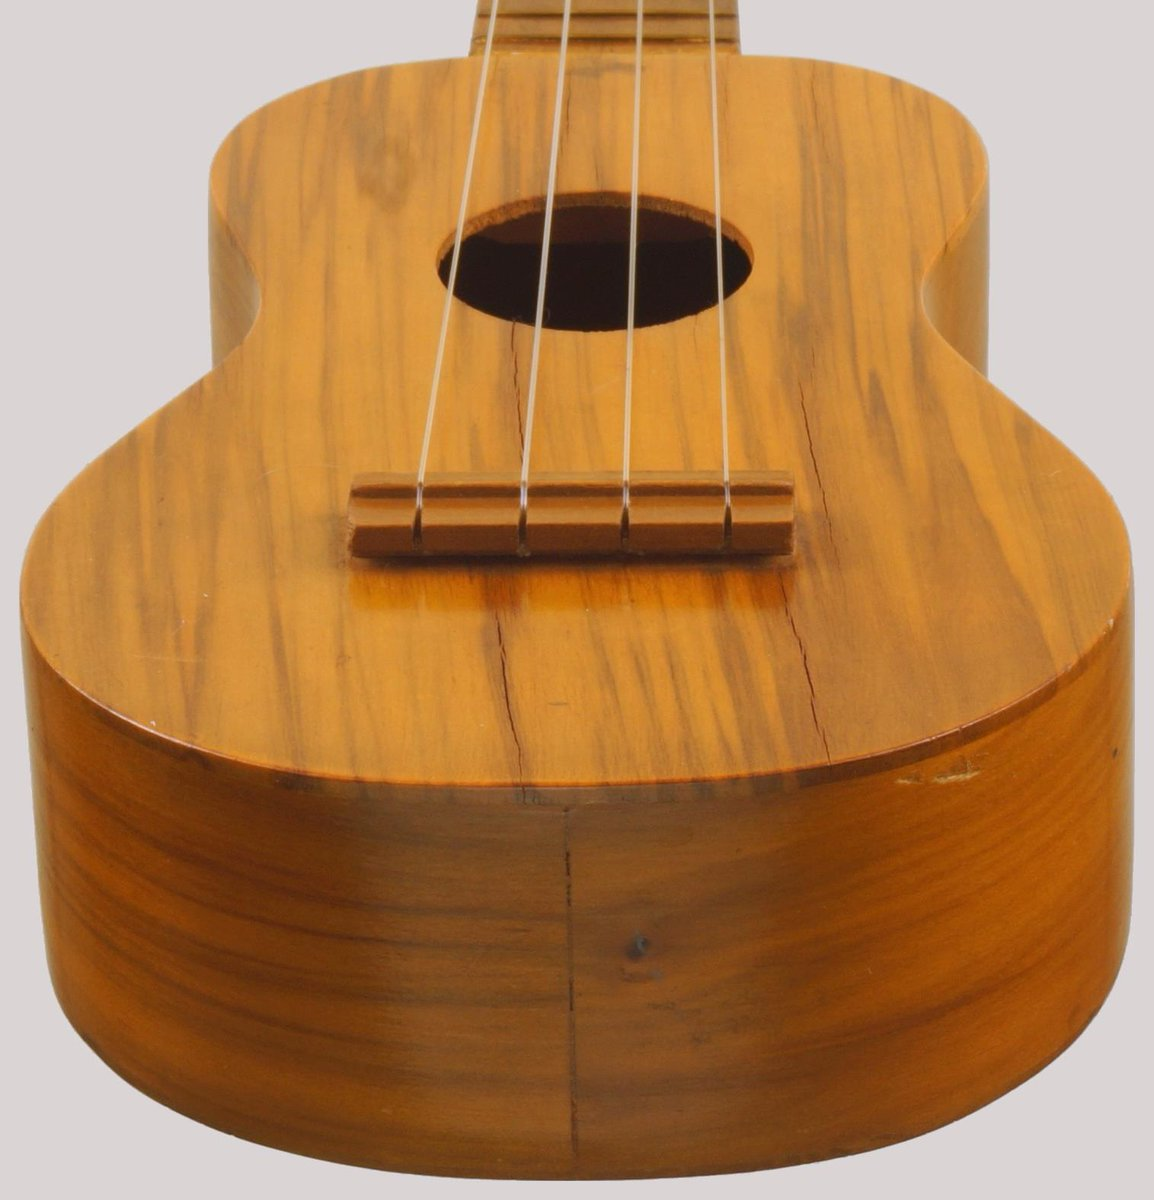 Lyon Healy mauna loa monkeypod soprano ukulele